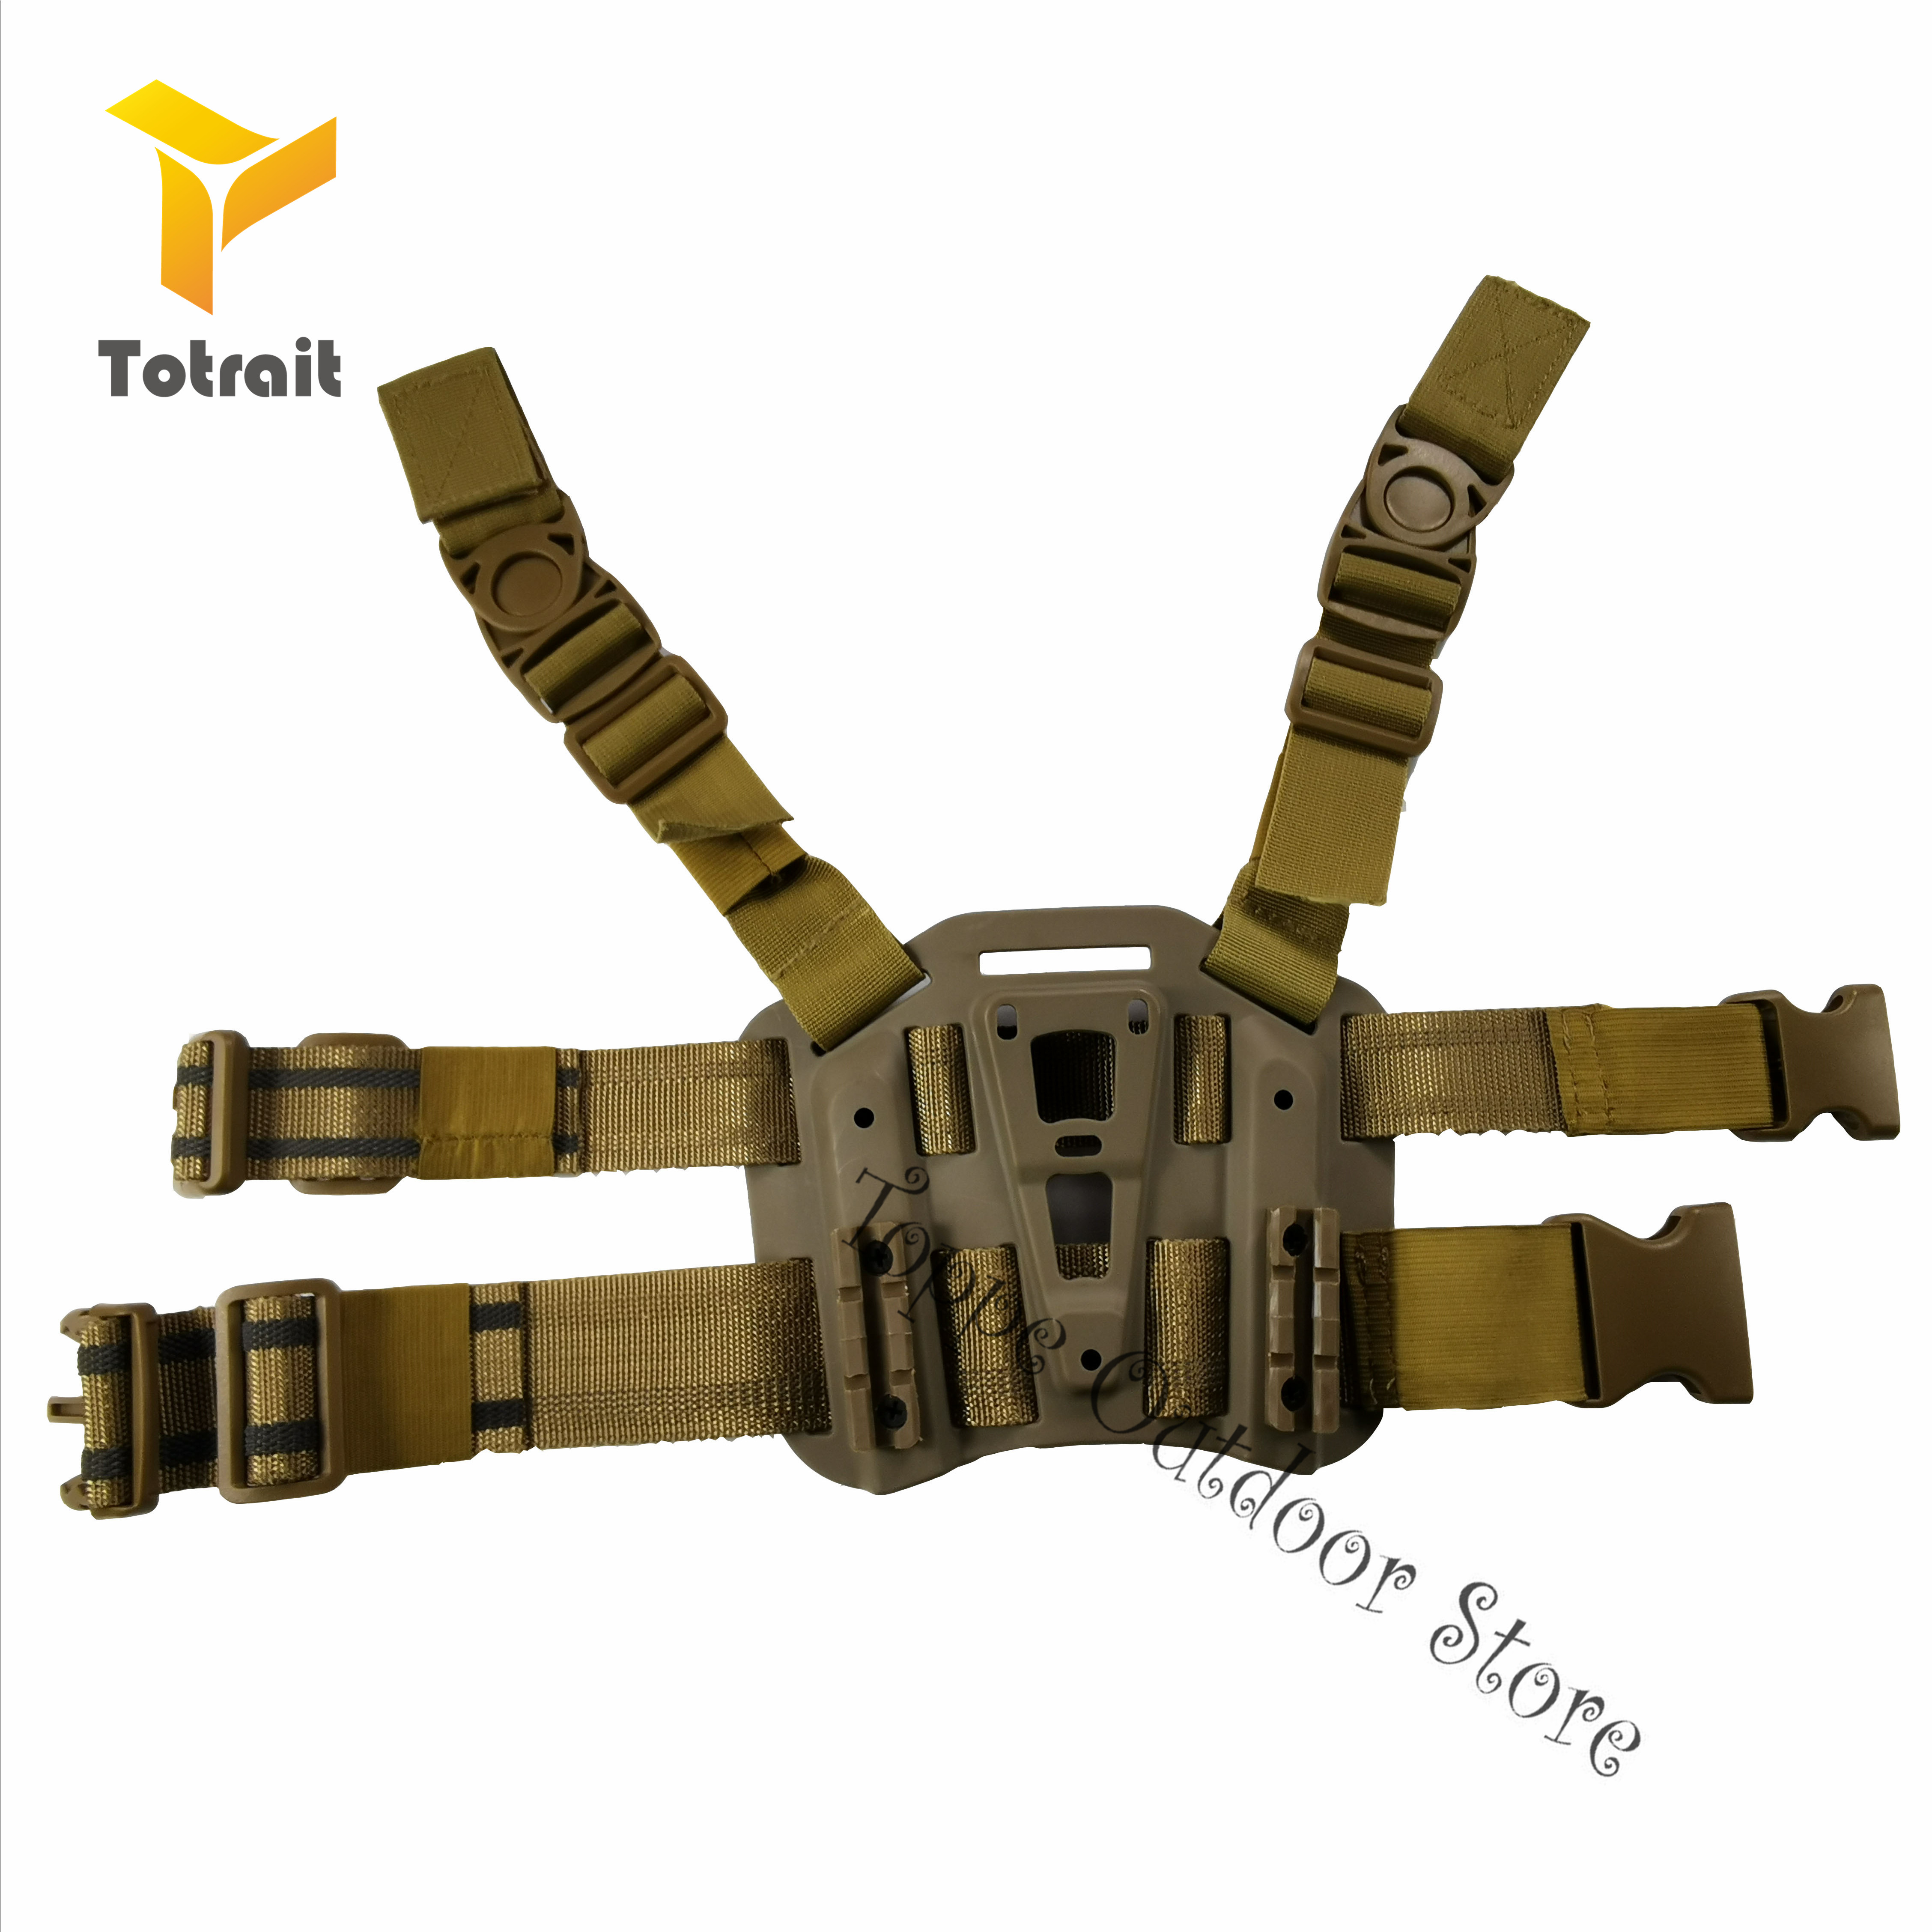 Military CQC Polymer Drop Leg Paddle Holster for Hunting USP Pistol Black// Green